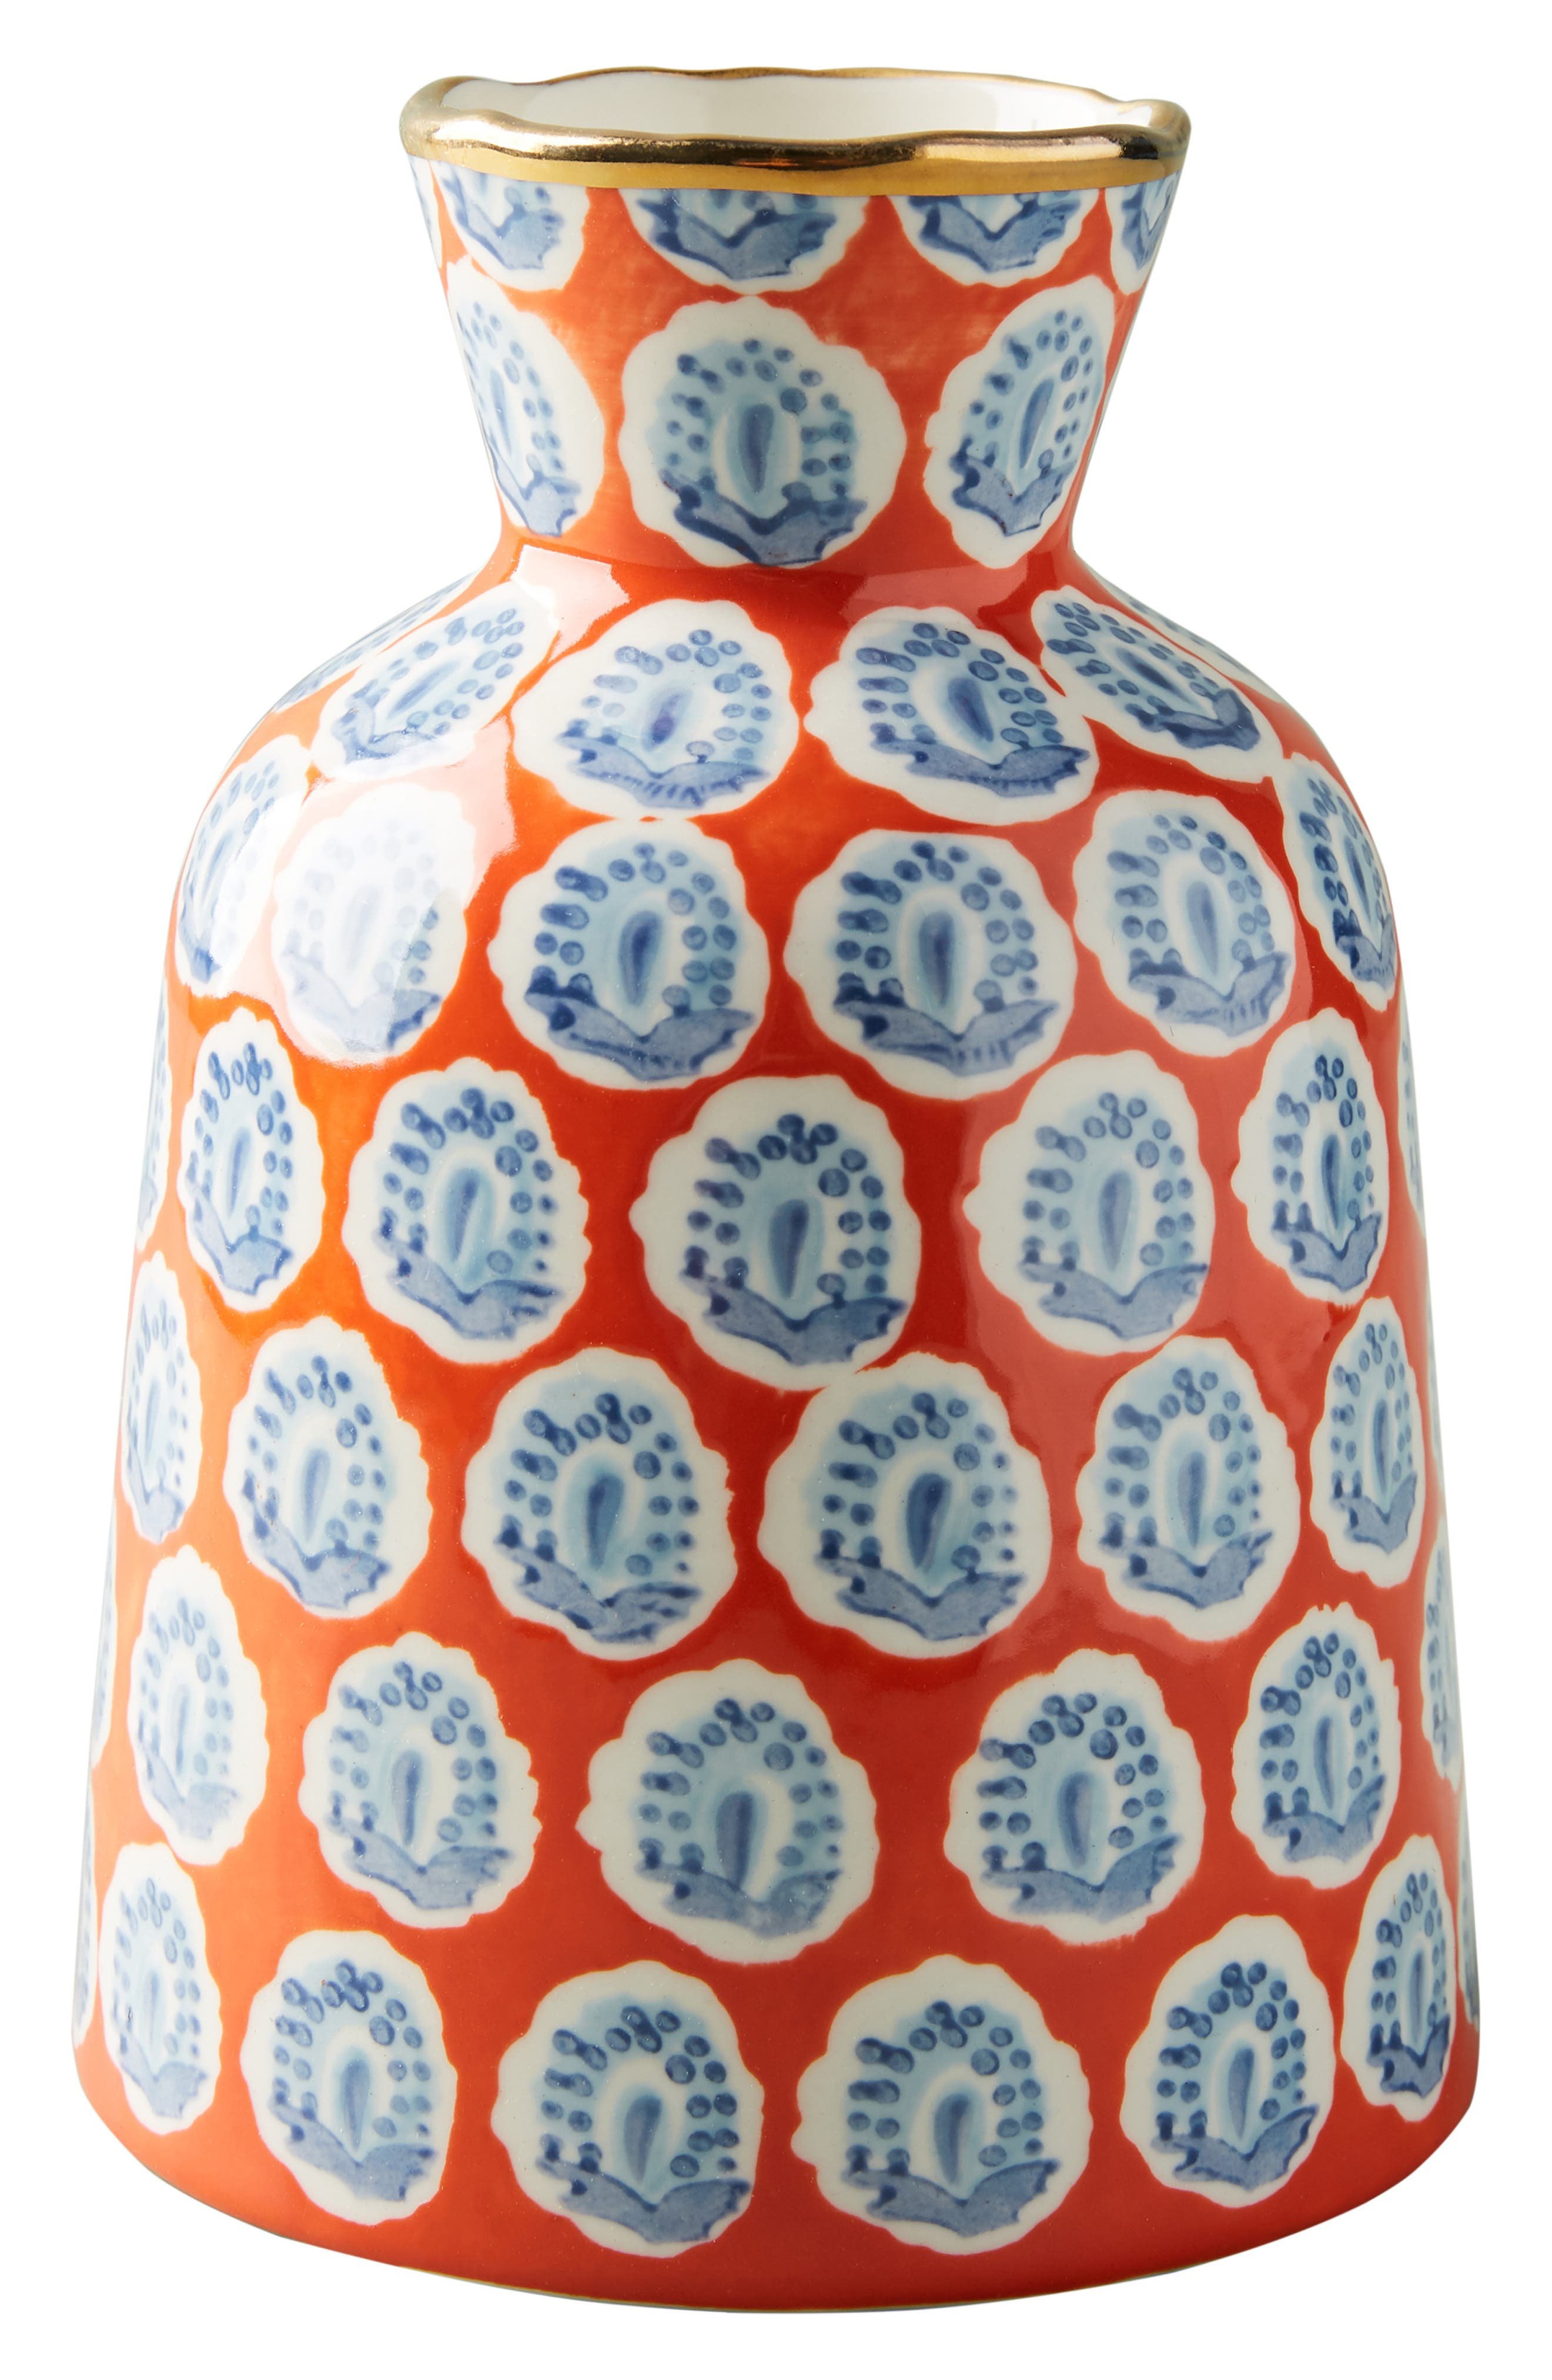 ANTHROPOLOGIE,                             Small Elsa Vase,                             Alternate thumbnail 4, color,                             WARM